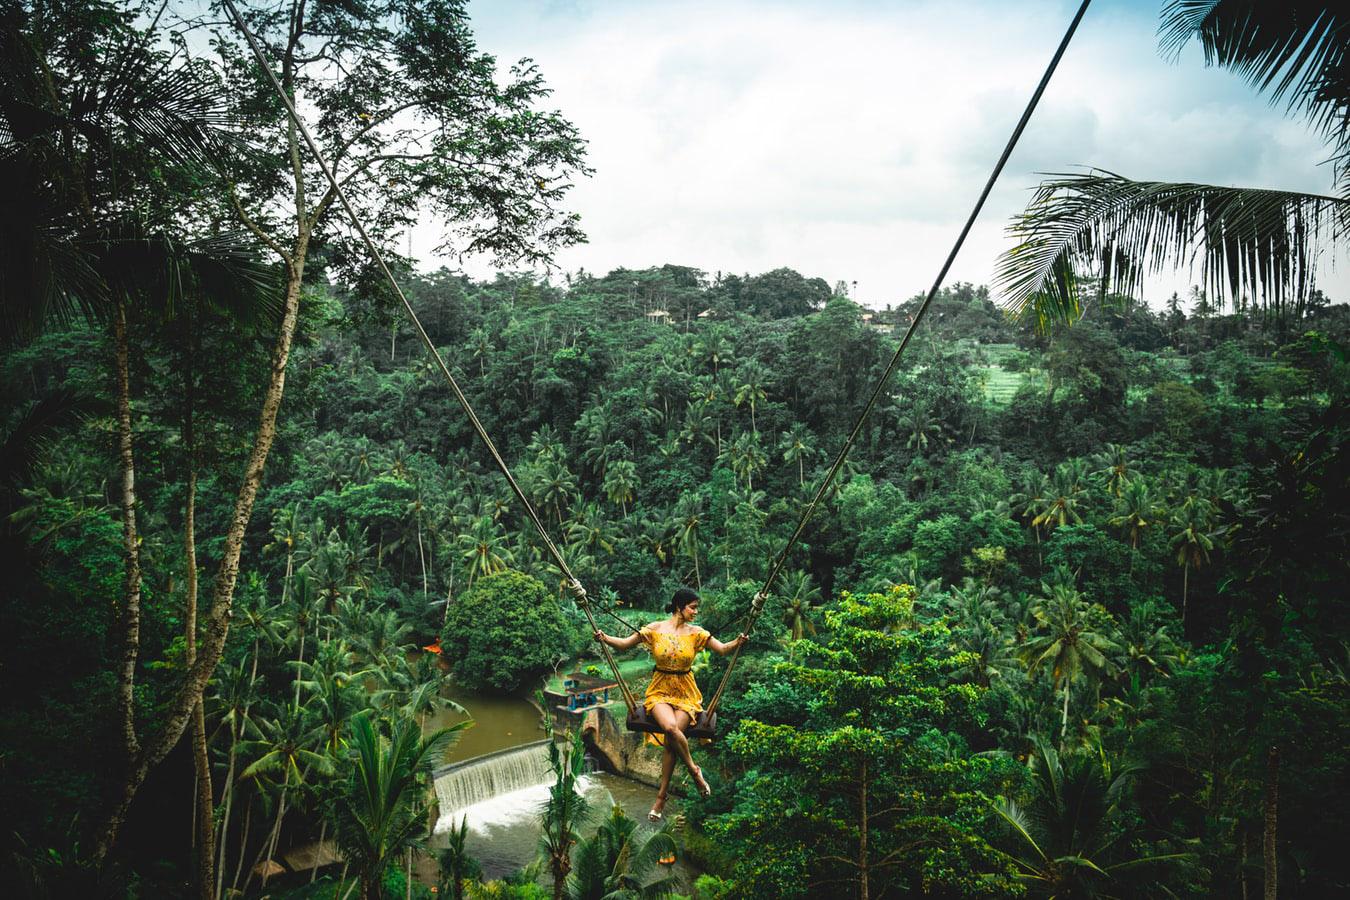 Ubud, l'altalena nella foresta.